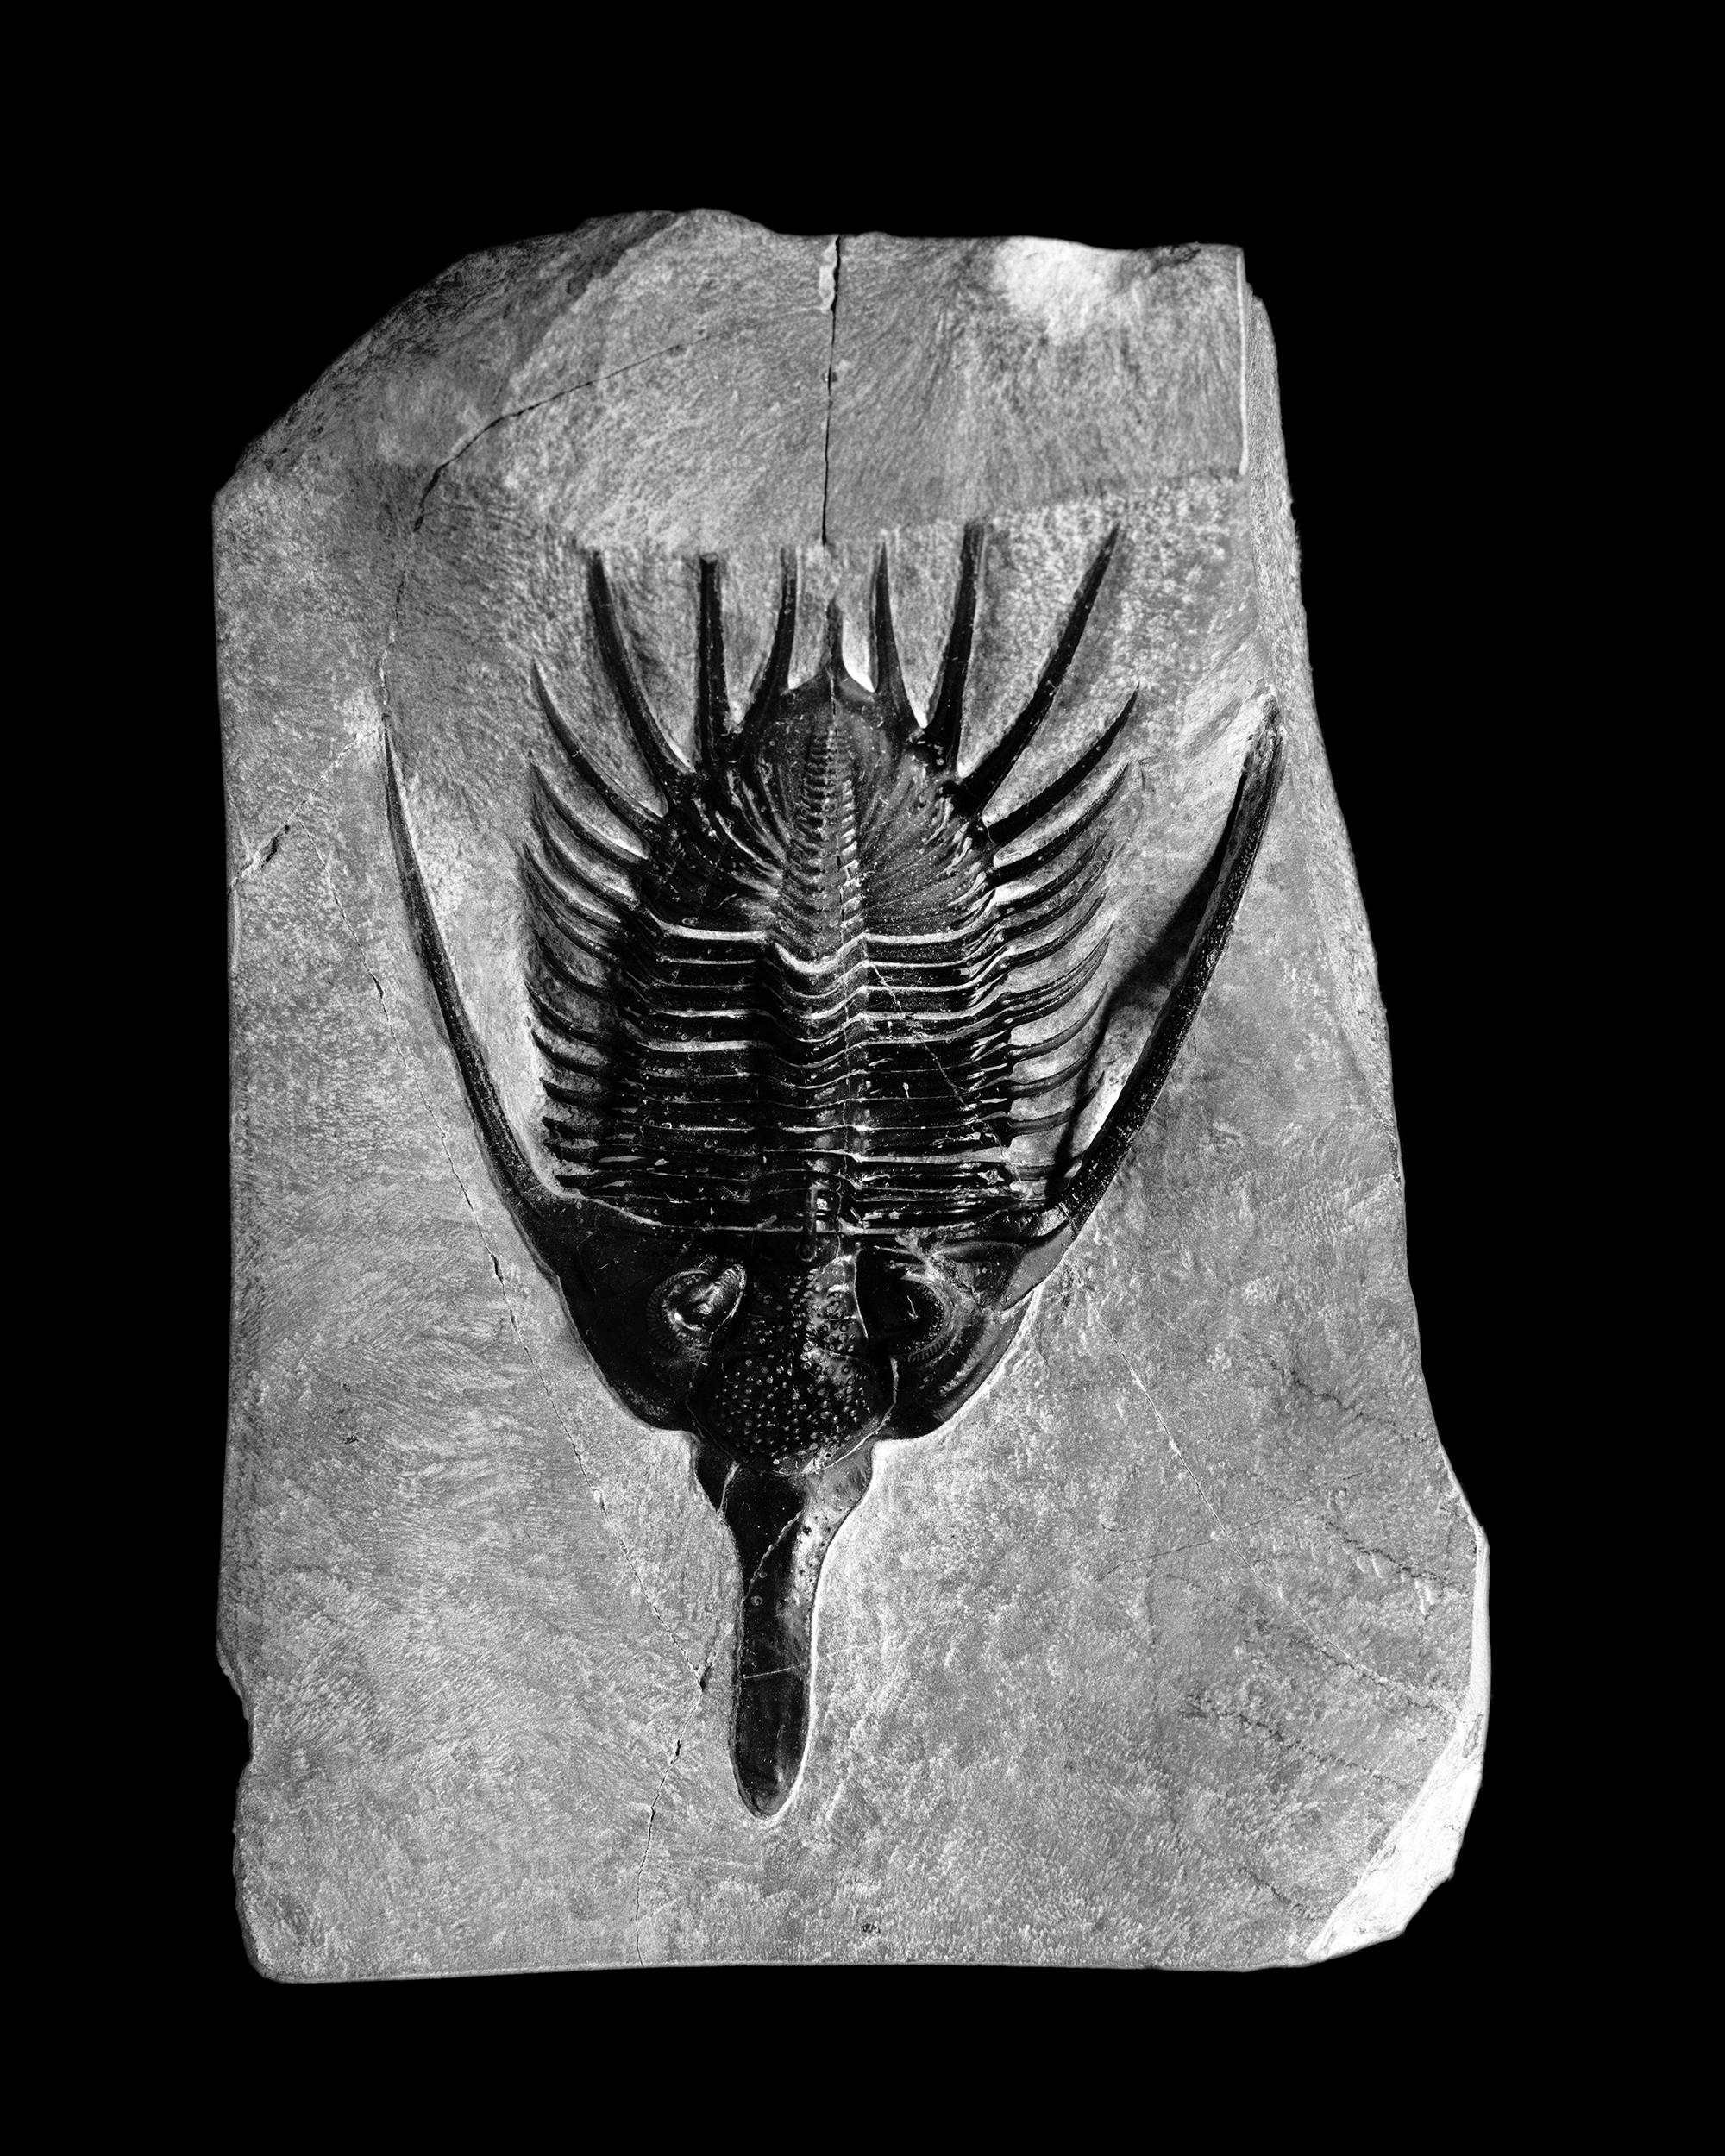 Psychopyge elegans Termier&Temier, Mittel-Devon, Marrokko